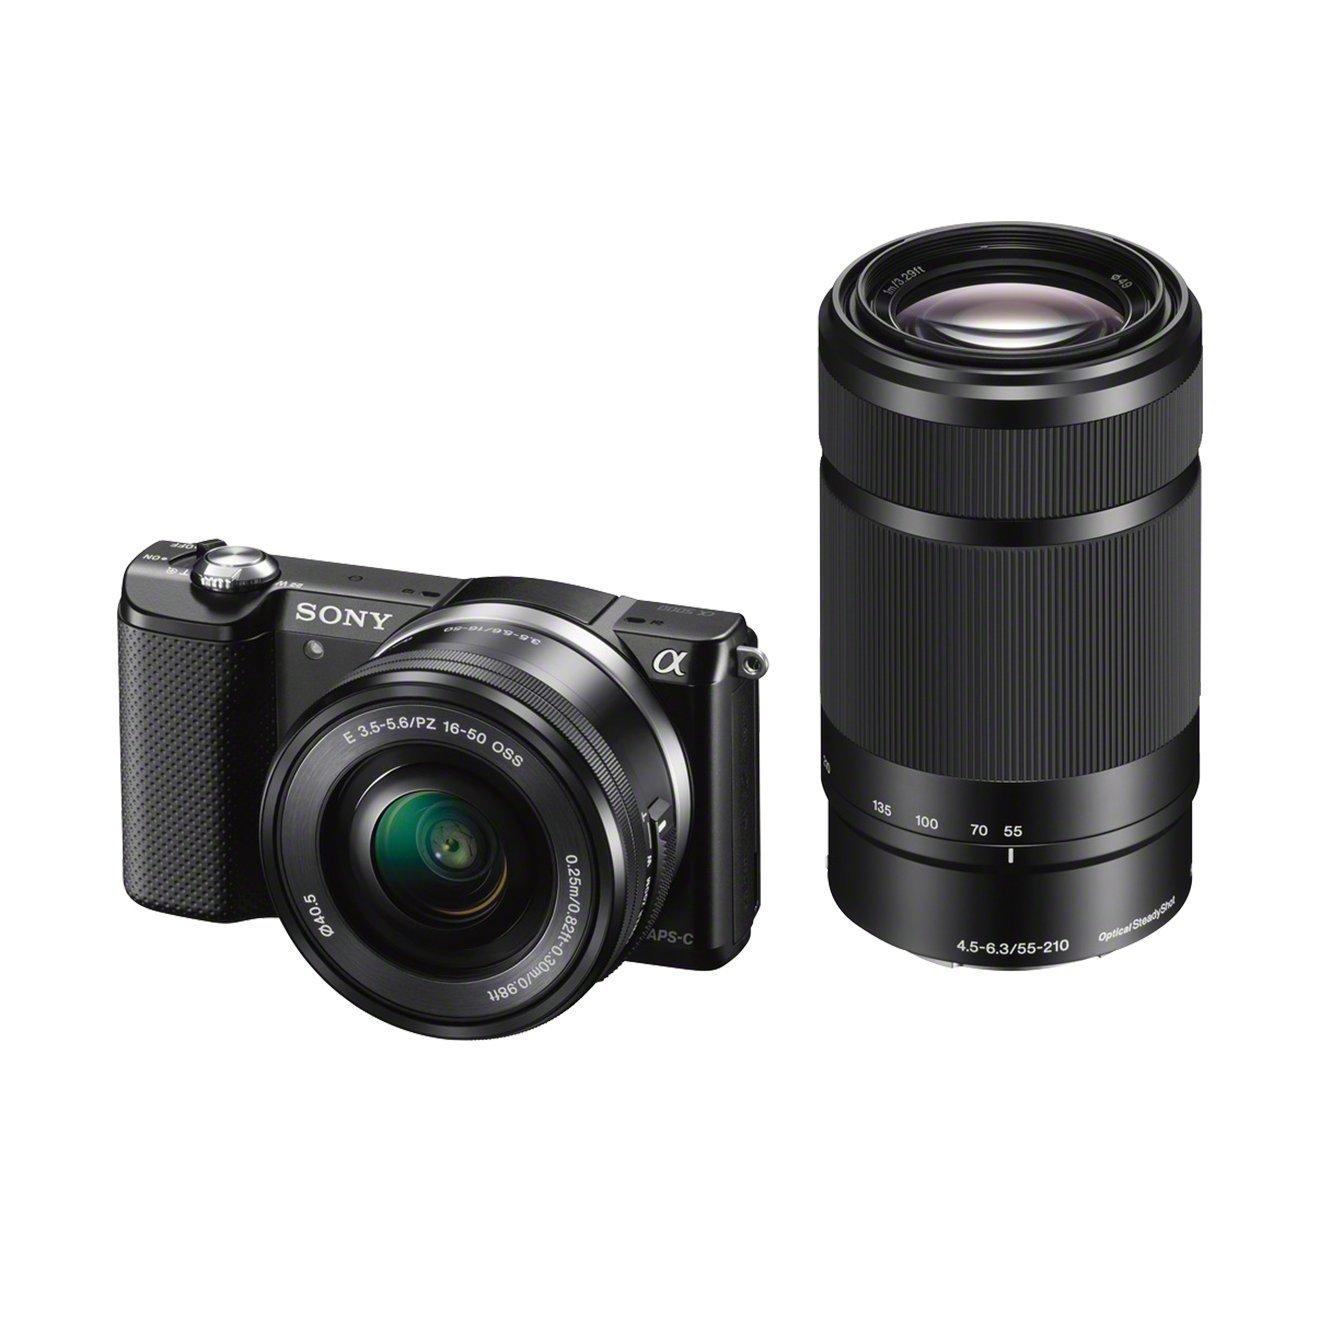 [amazon.es] Sony Alpha 5000 Systemkamera (Full HD, 20 Megapixel, Exmor APS-C HD CMOS Sensor, 3 Zoll Schwenkdisplay, NFC, WiFi) schwarz inklusive SEL-P1650 & SEL-55210 Objektiv für 428€ statt 584€